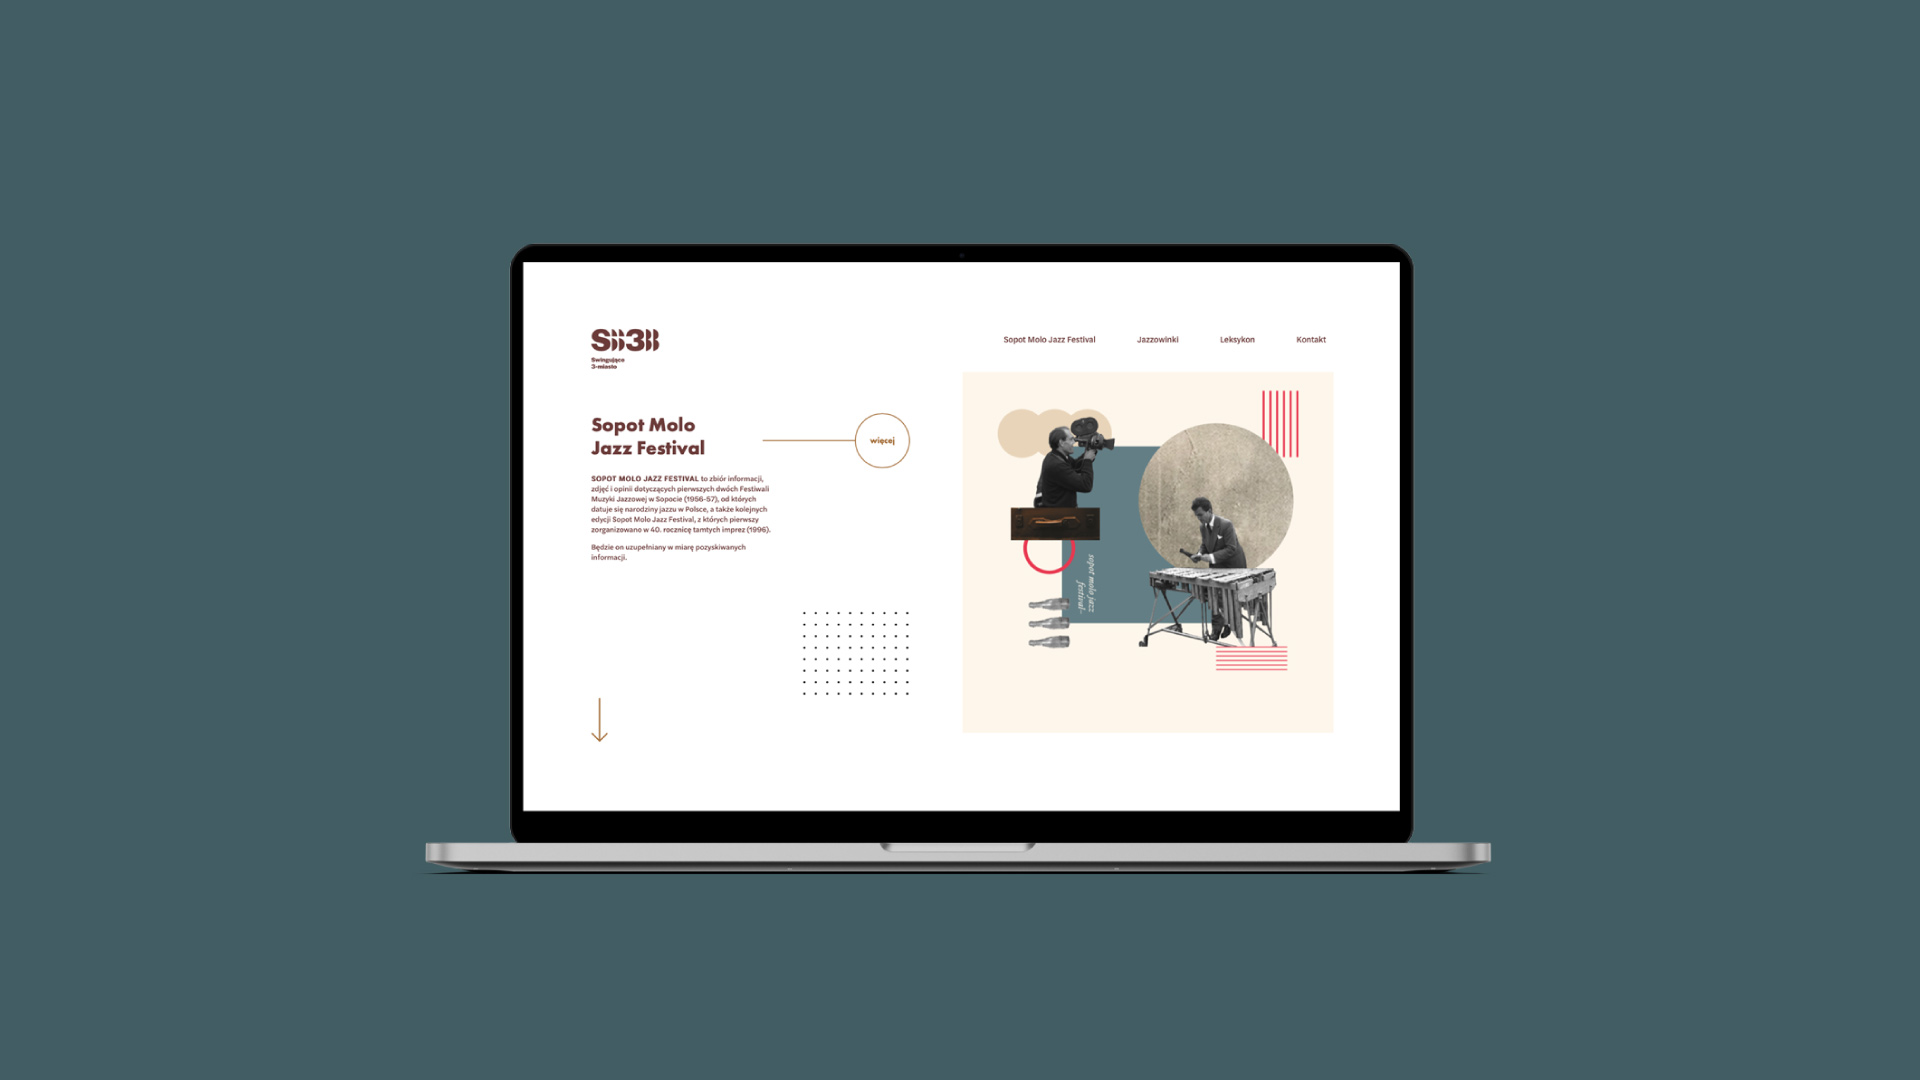 web design projekt studio graficzne UI/UX swingujące 3-miasto